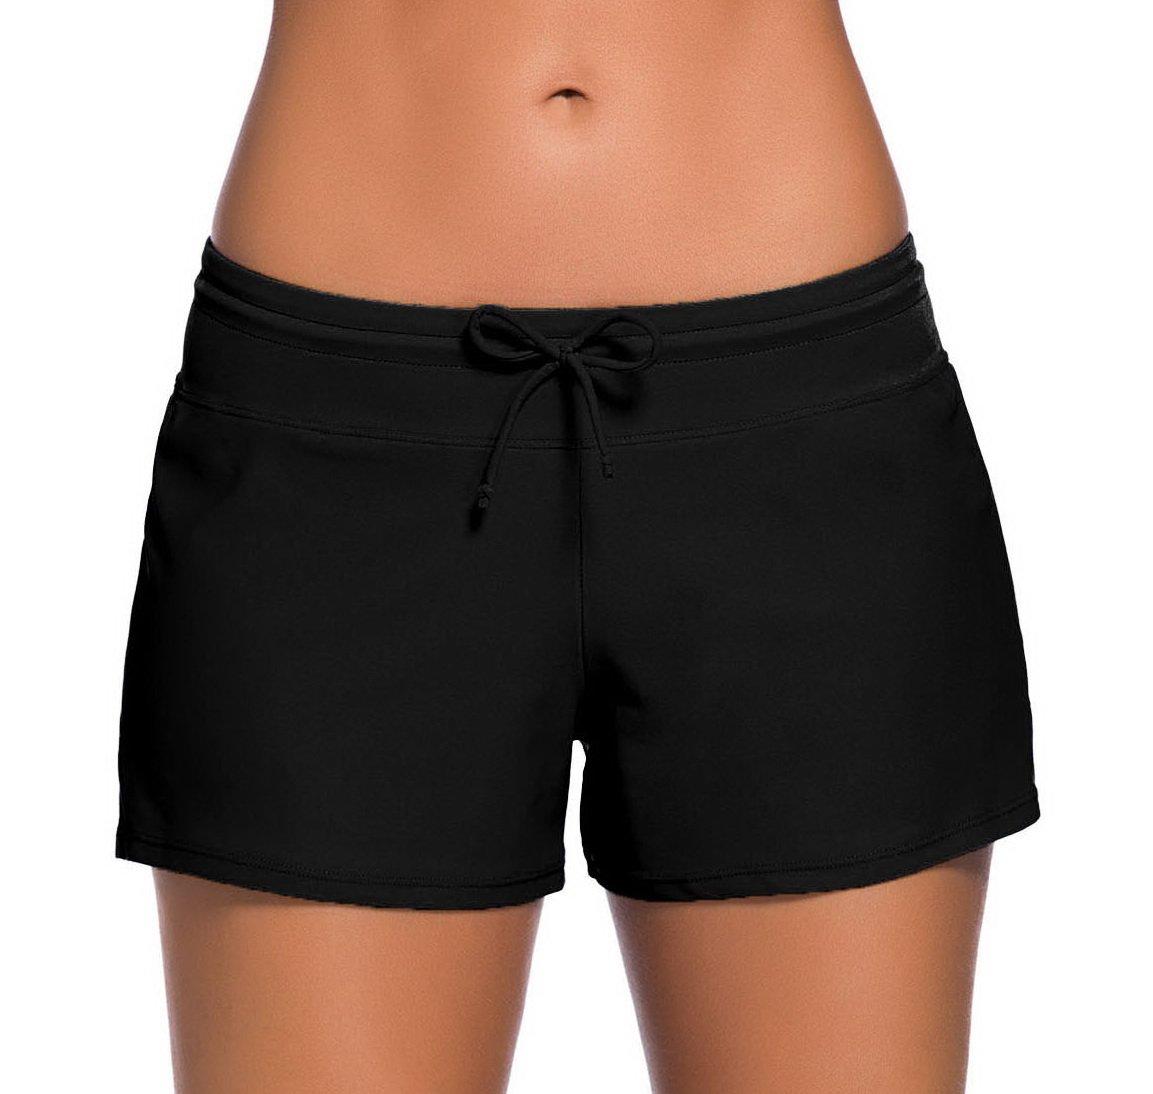 Sythyee Women's Swim Boardshorts Tankini Boyshorts Beach Bottom Swimsuit Built in Briefs Black Size S